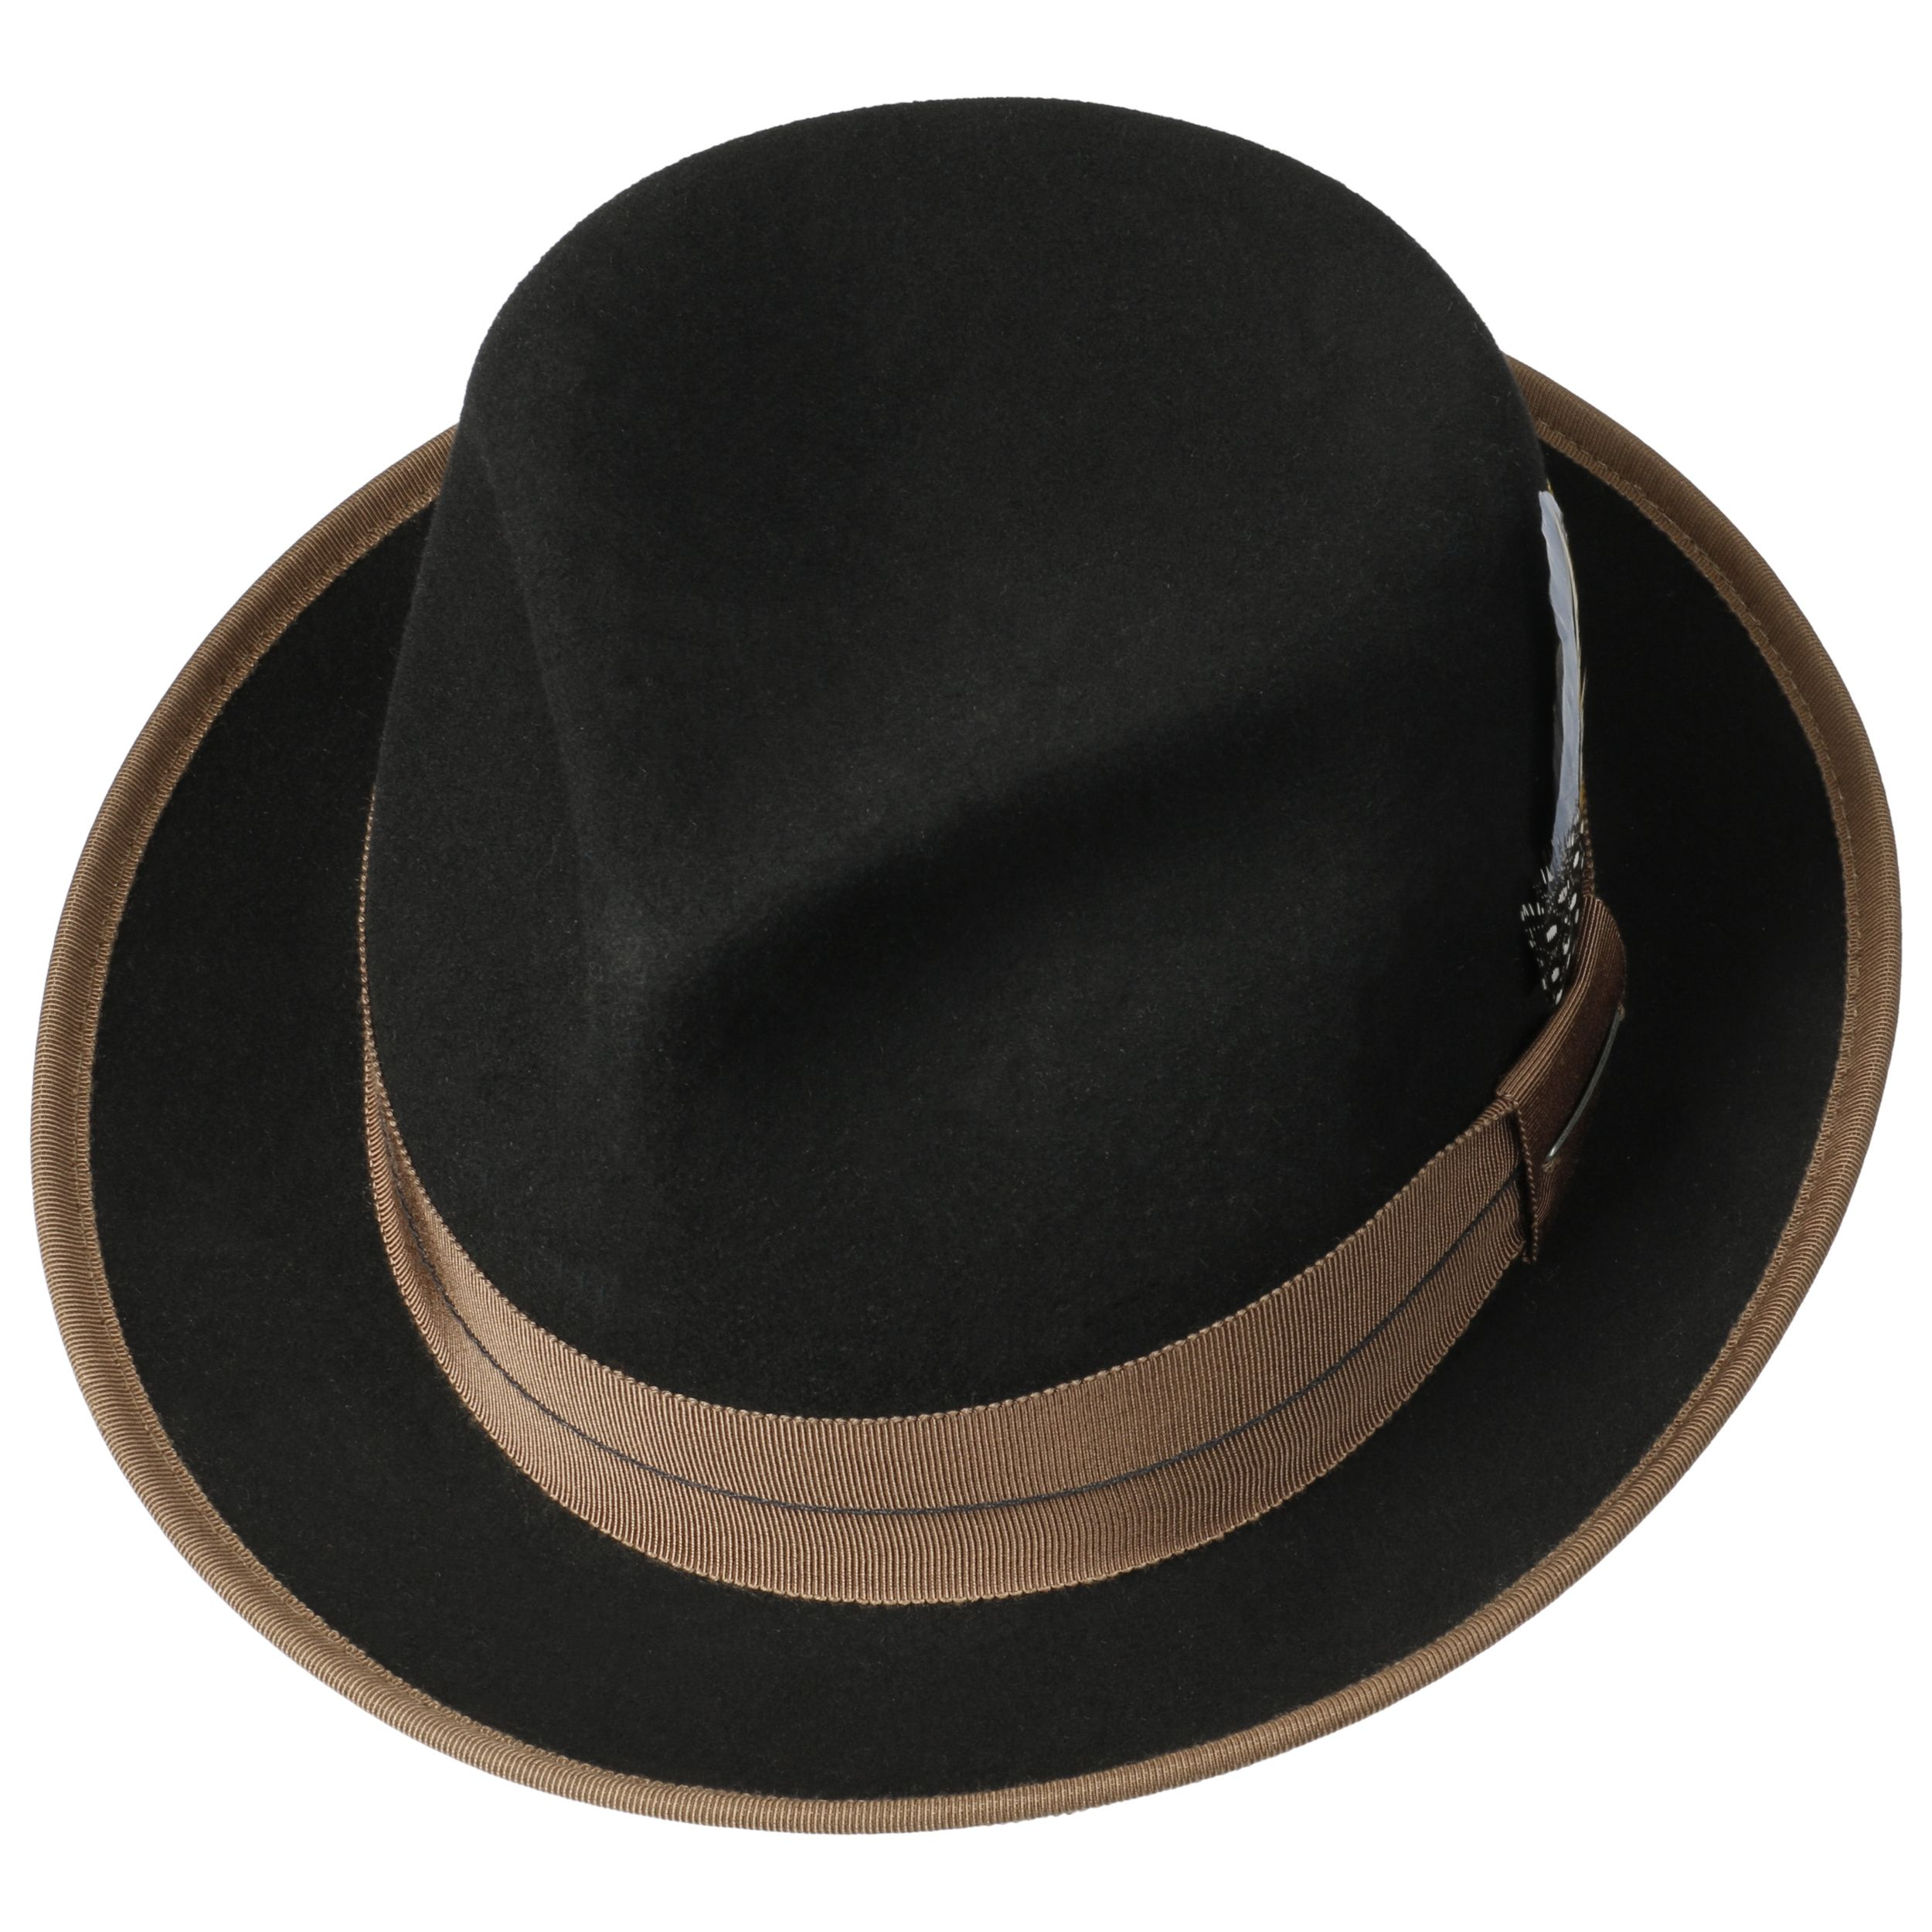 Orleans Fedora VitaFelt Hat black